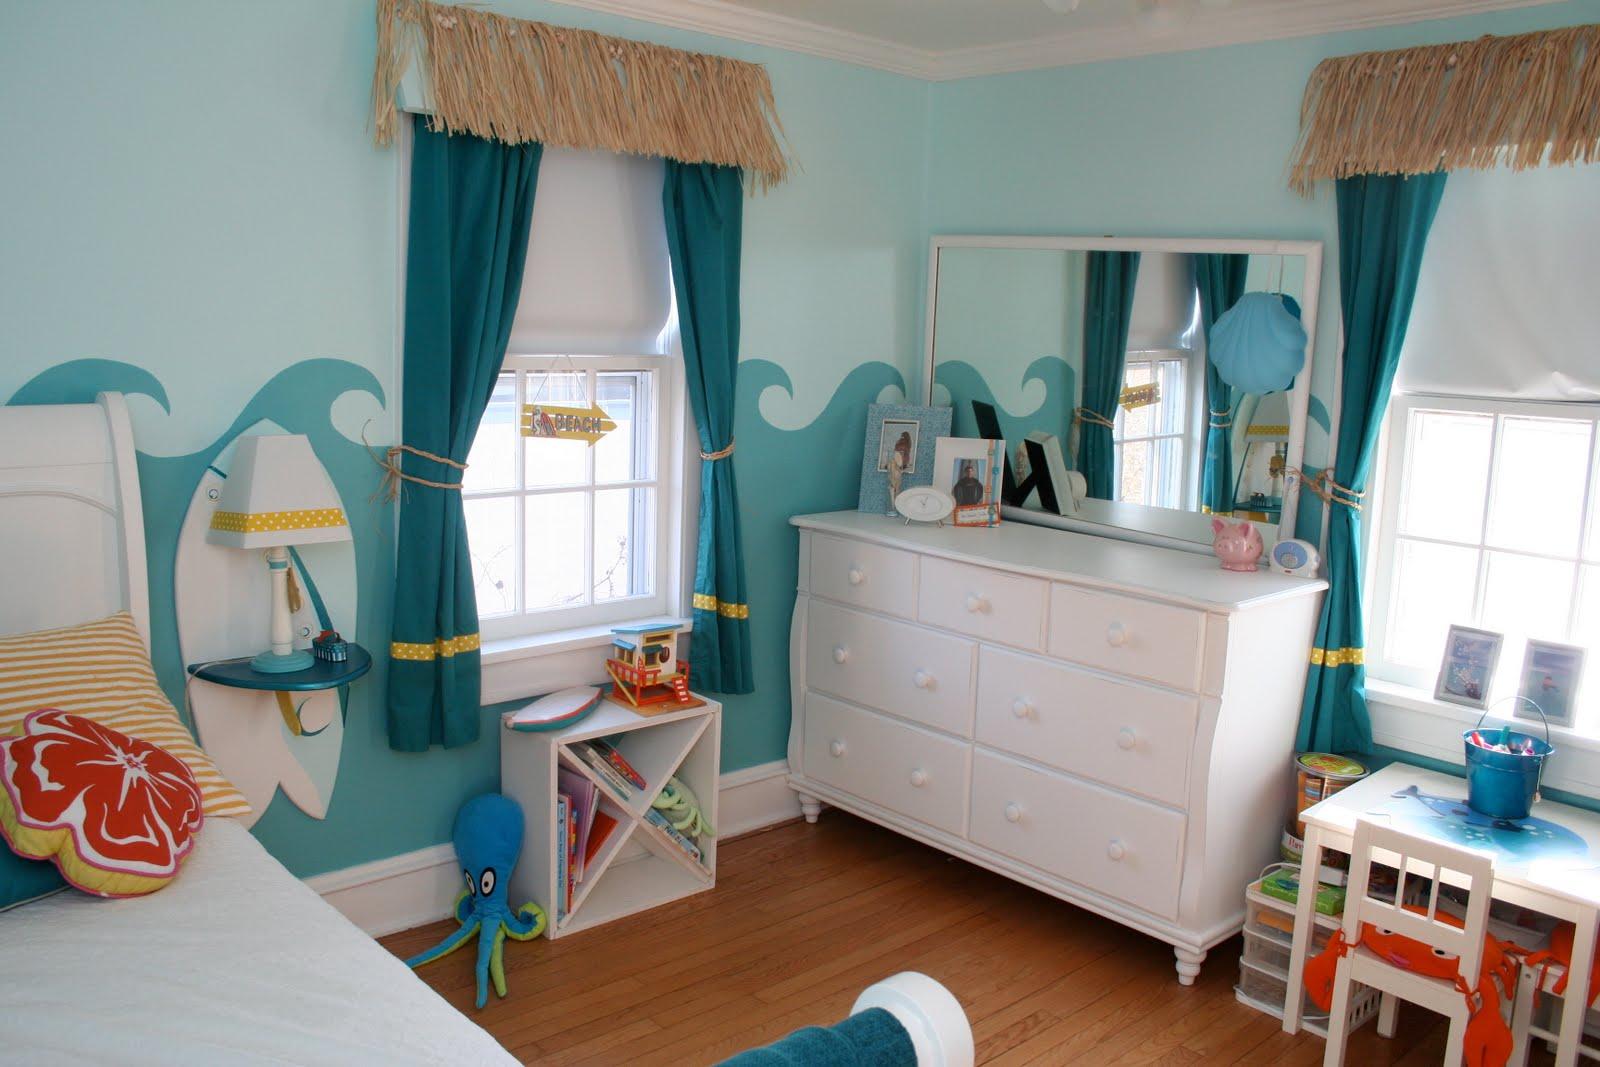 Bedroom Decorating Ideas For Teenage Girls: Little Girl's Surfer Room